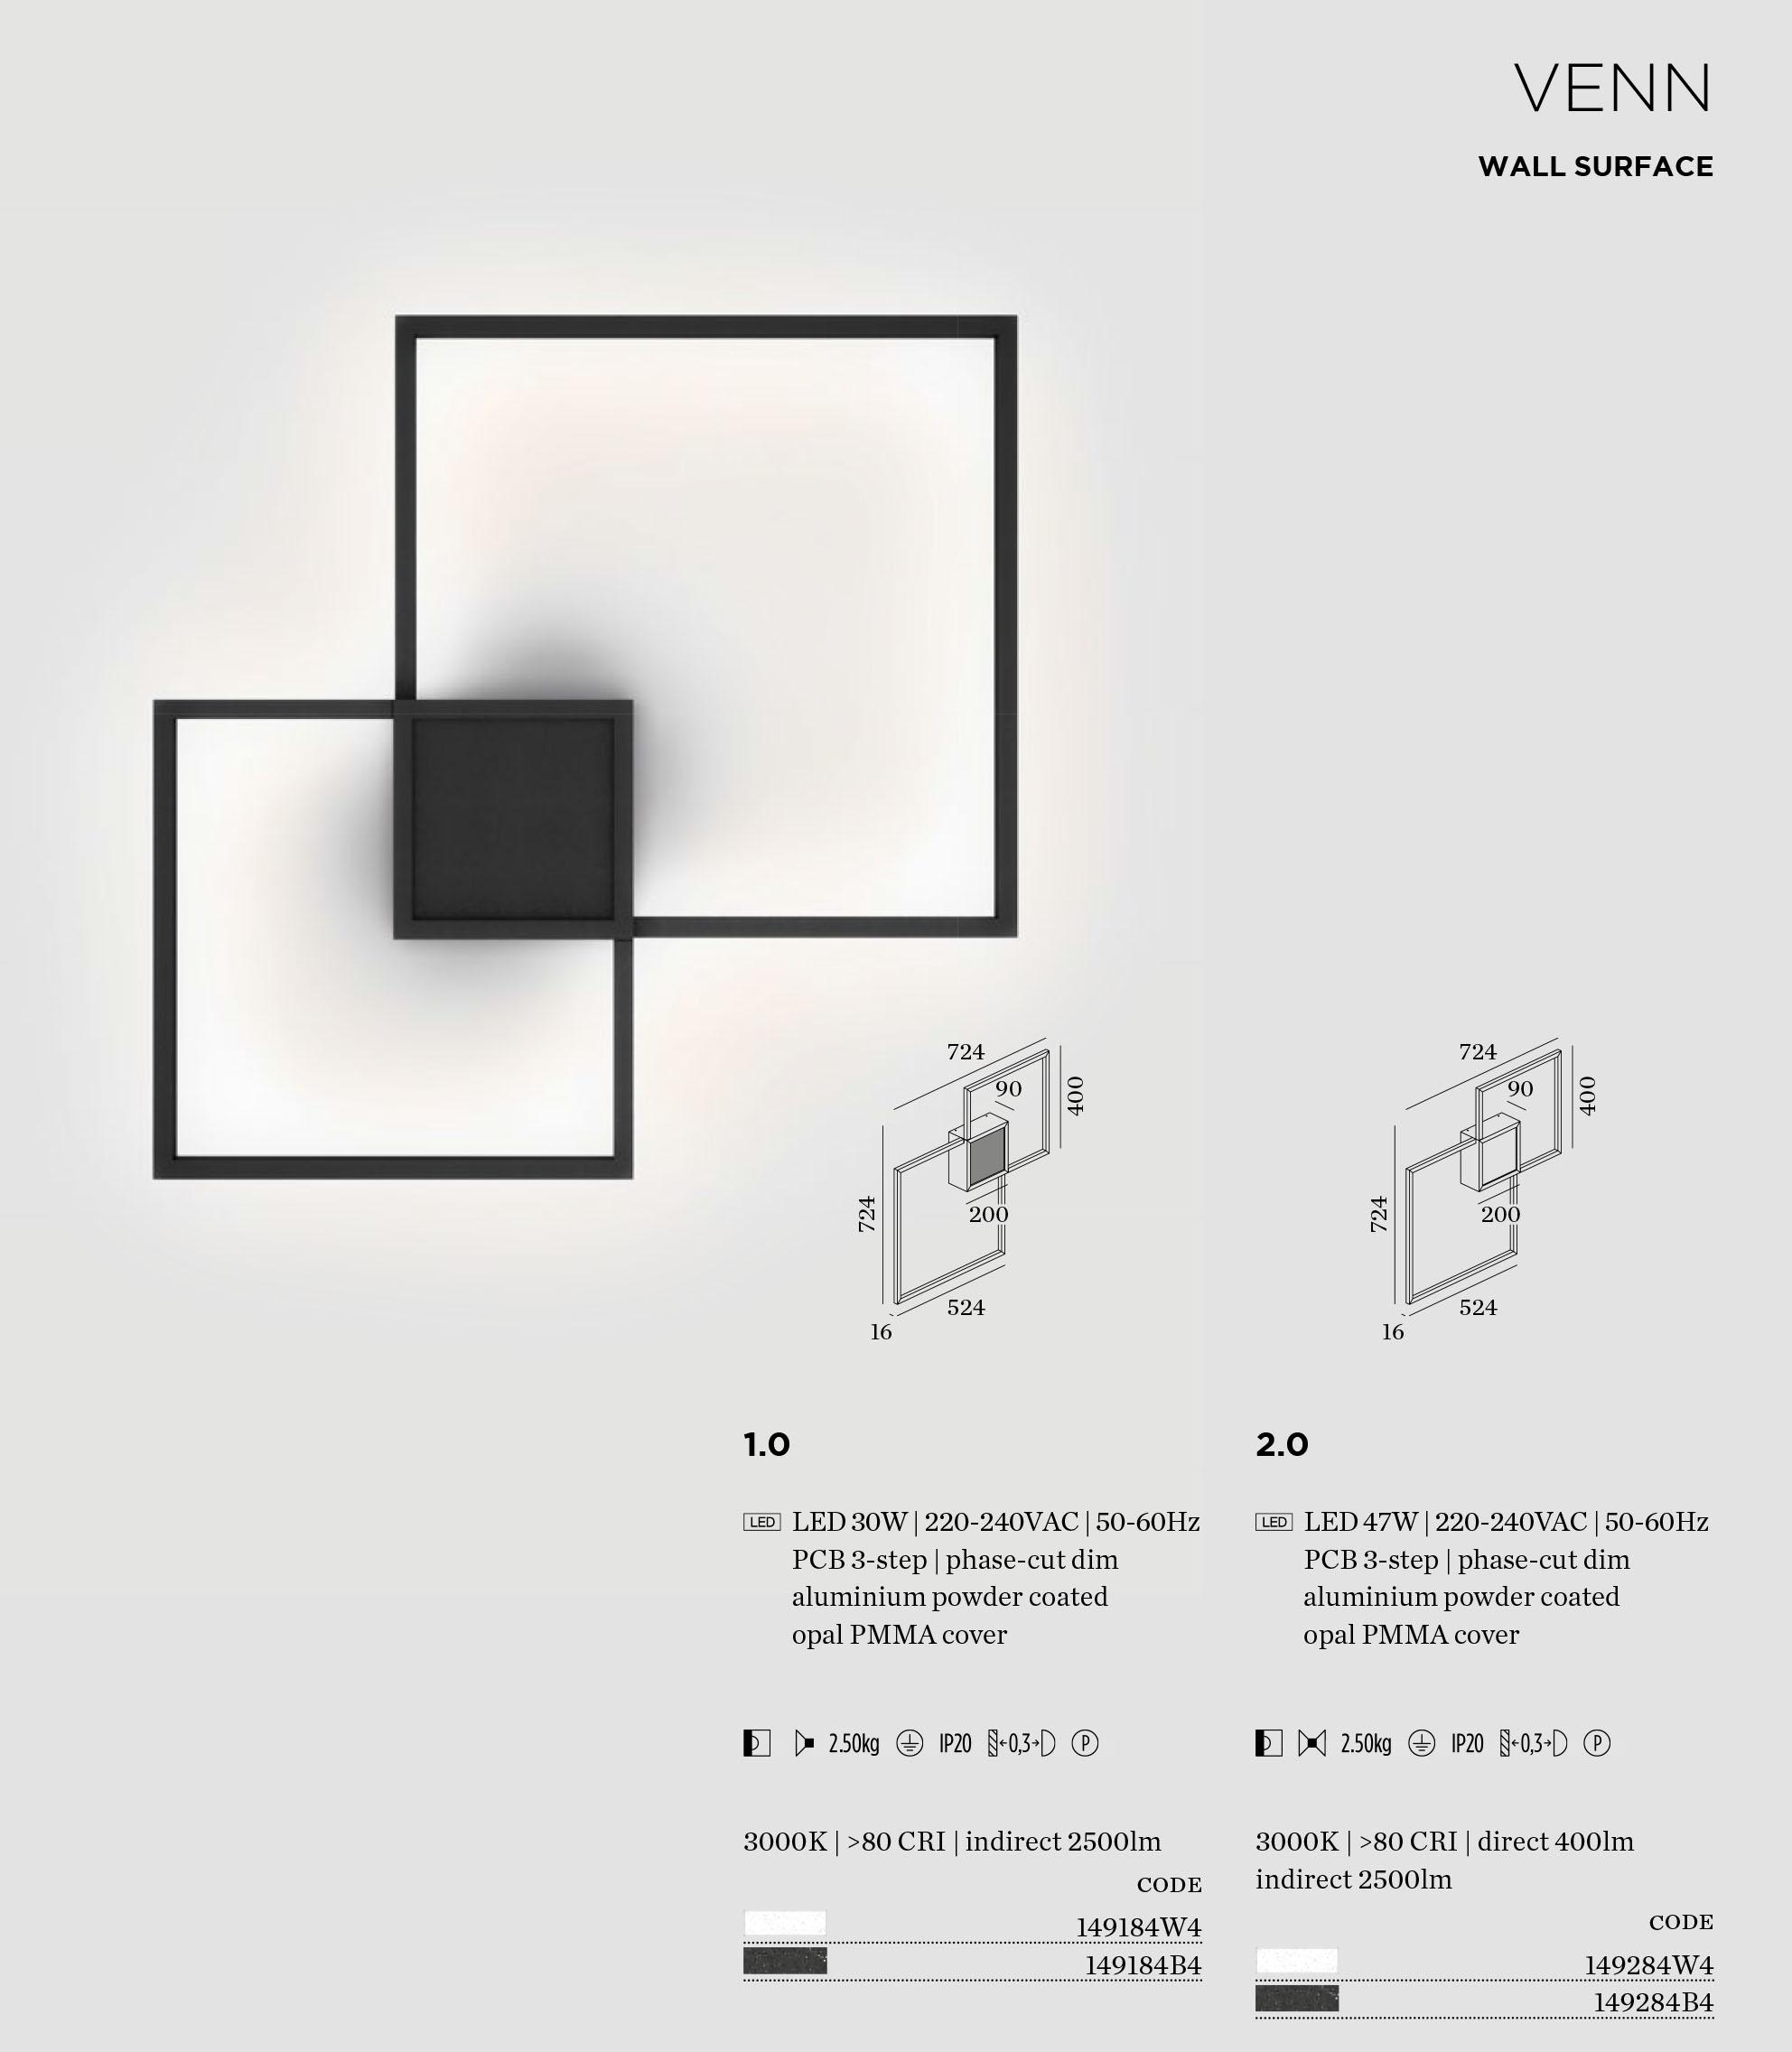 weber ducr venn 1 0 et 2 0 applique eclairage led. Black Bedroom Furniture Sets. Home Design Ideas